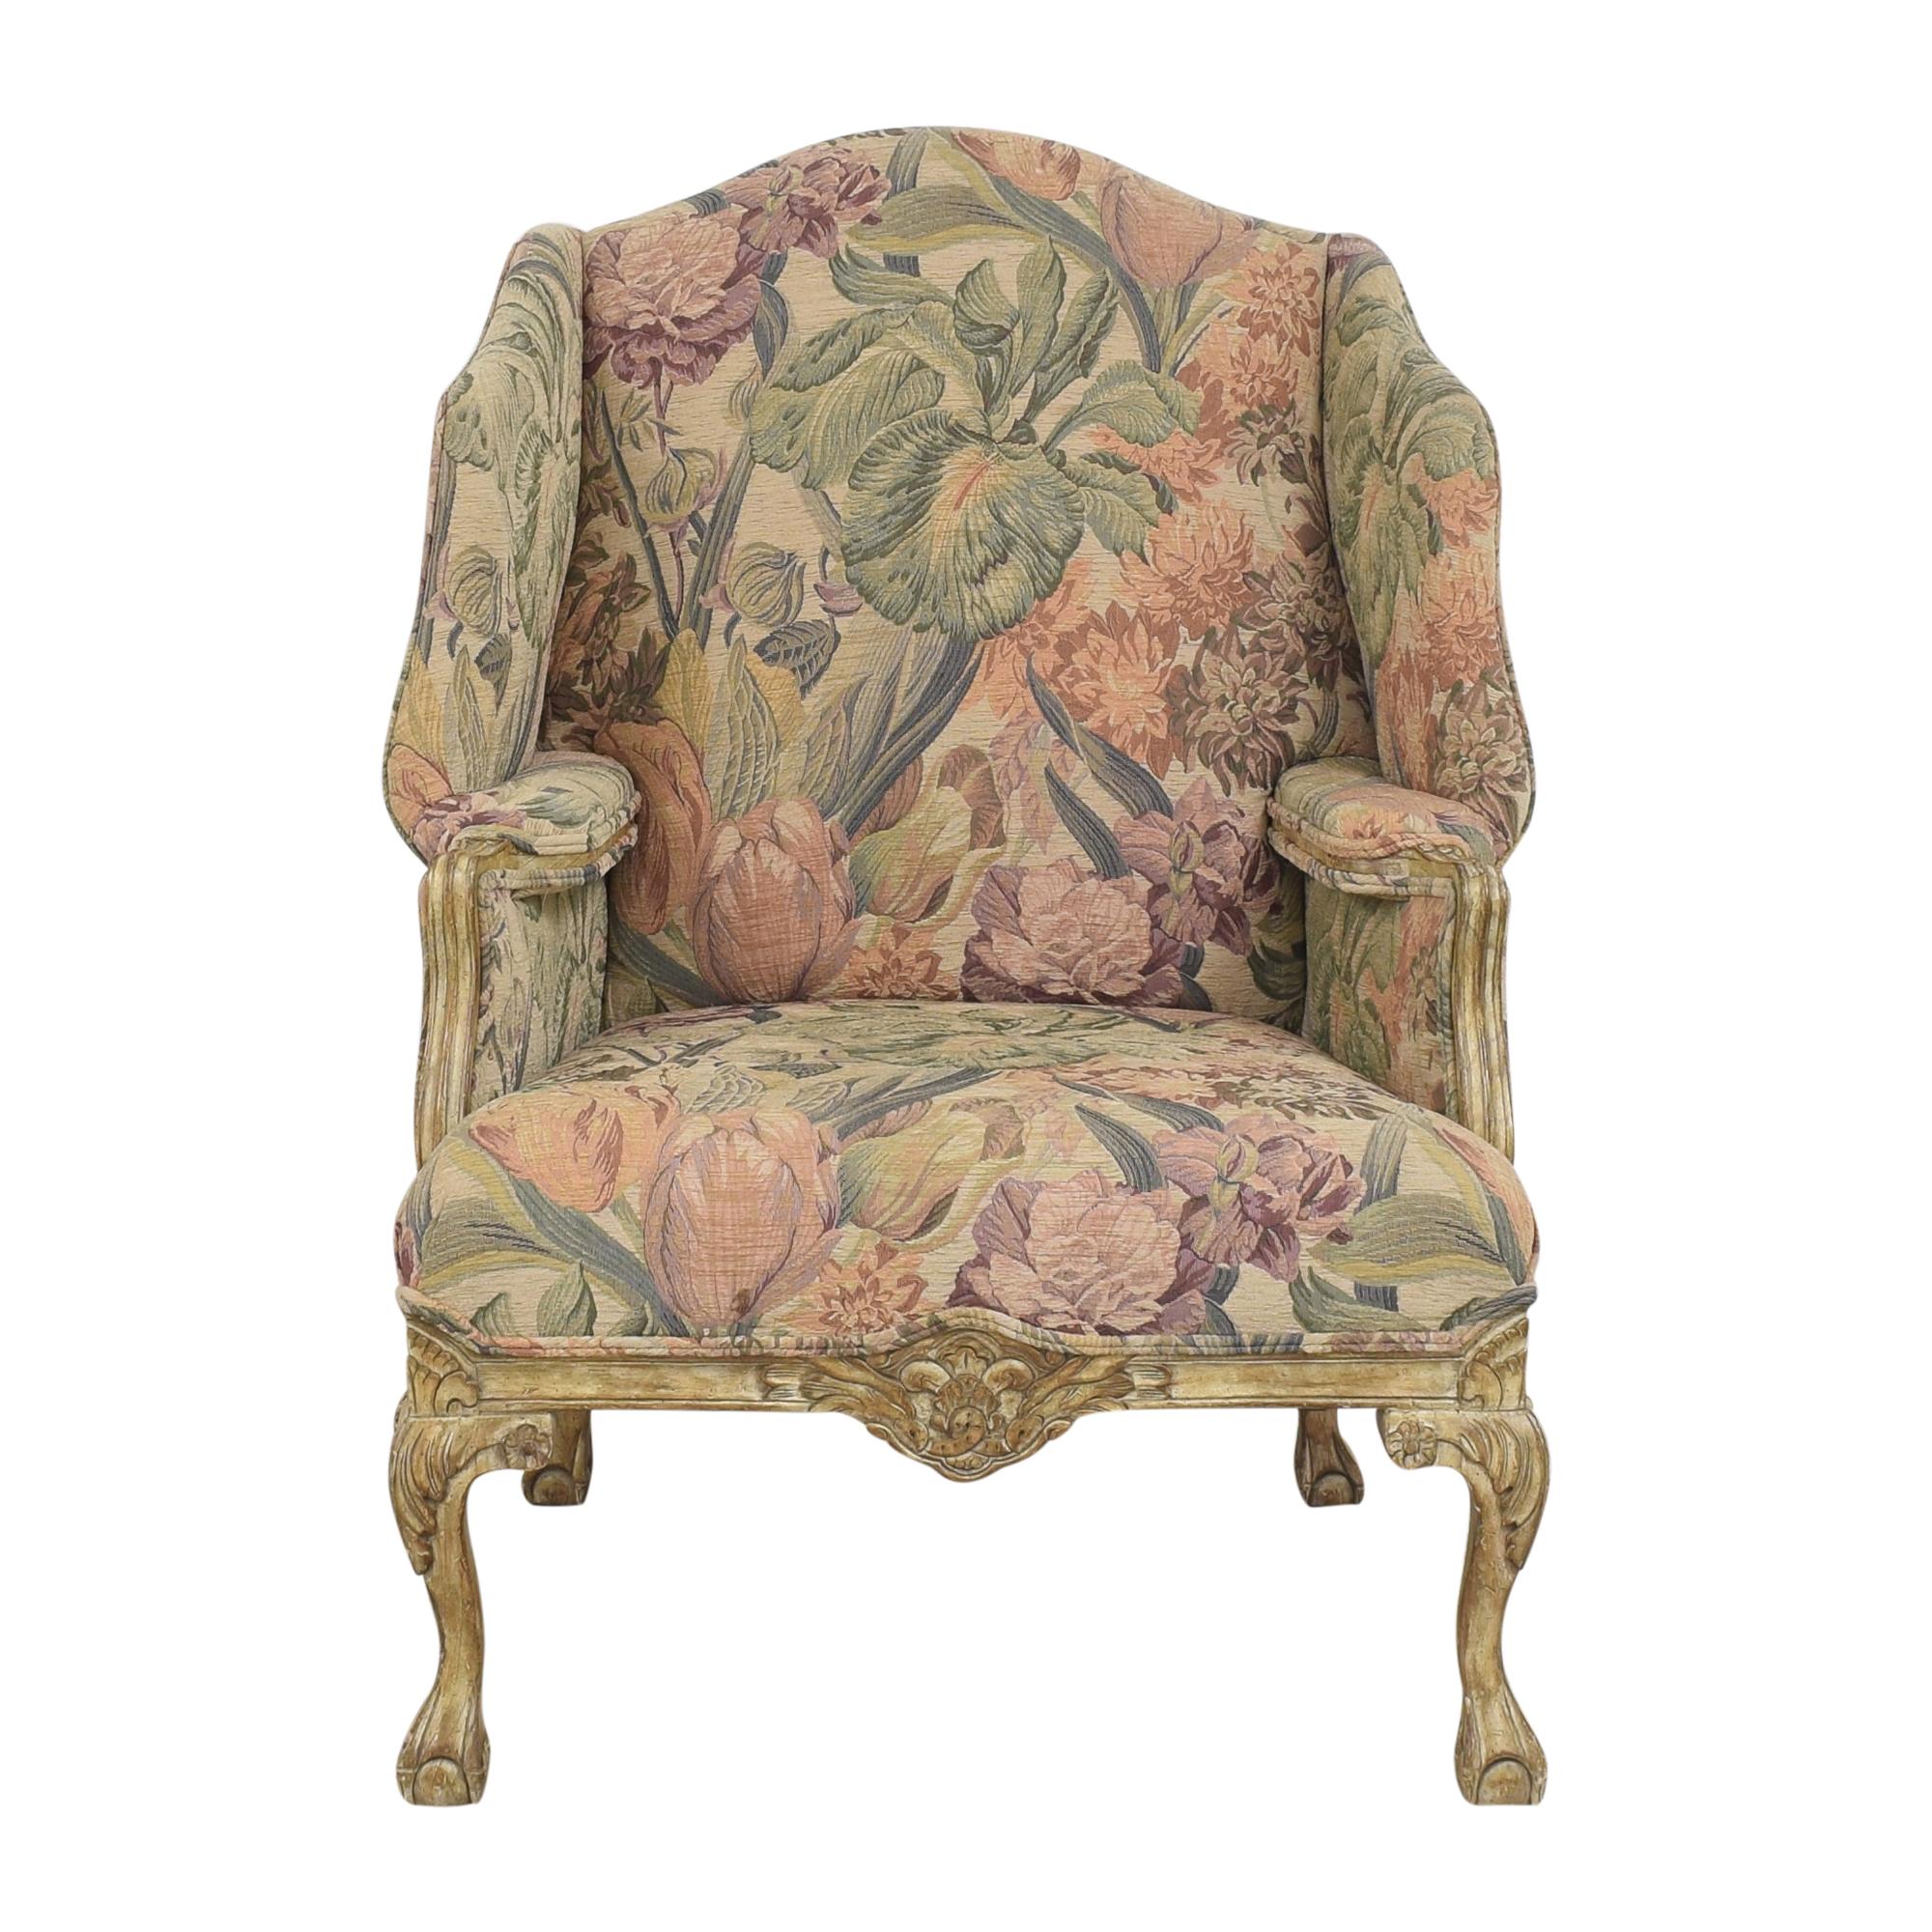 Safavieh Safavieh Carved Trim Accent Chair coupon